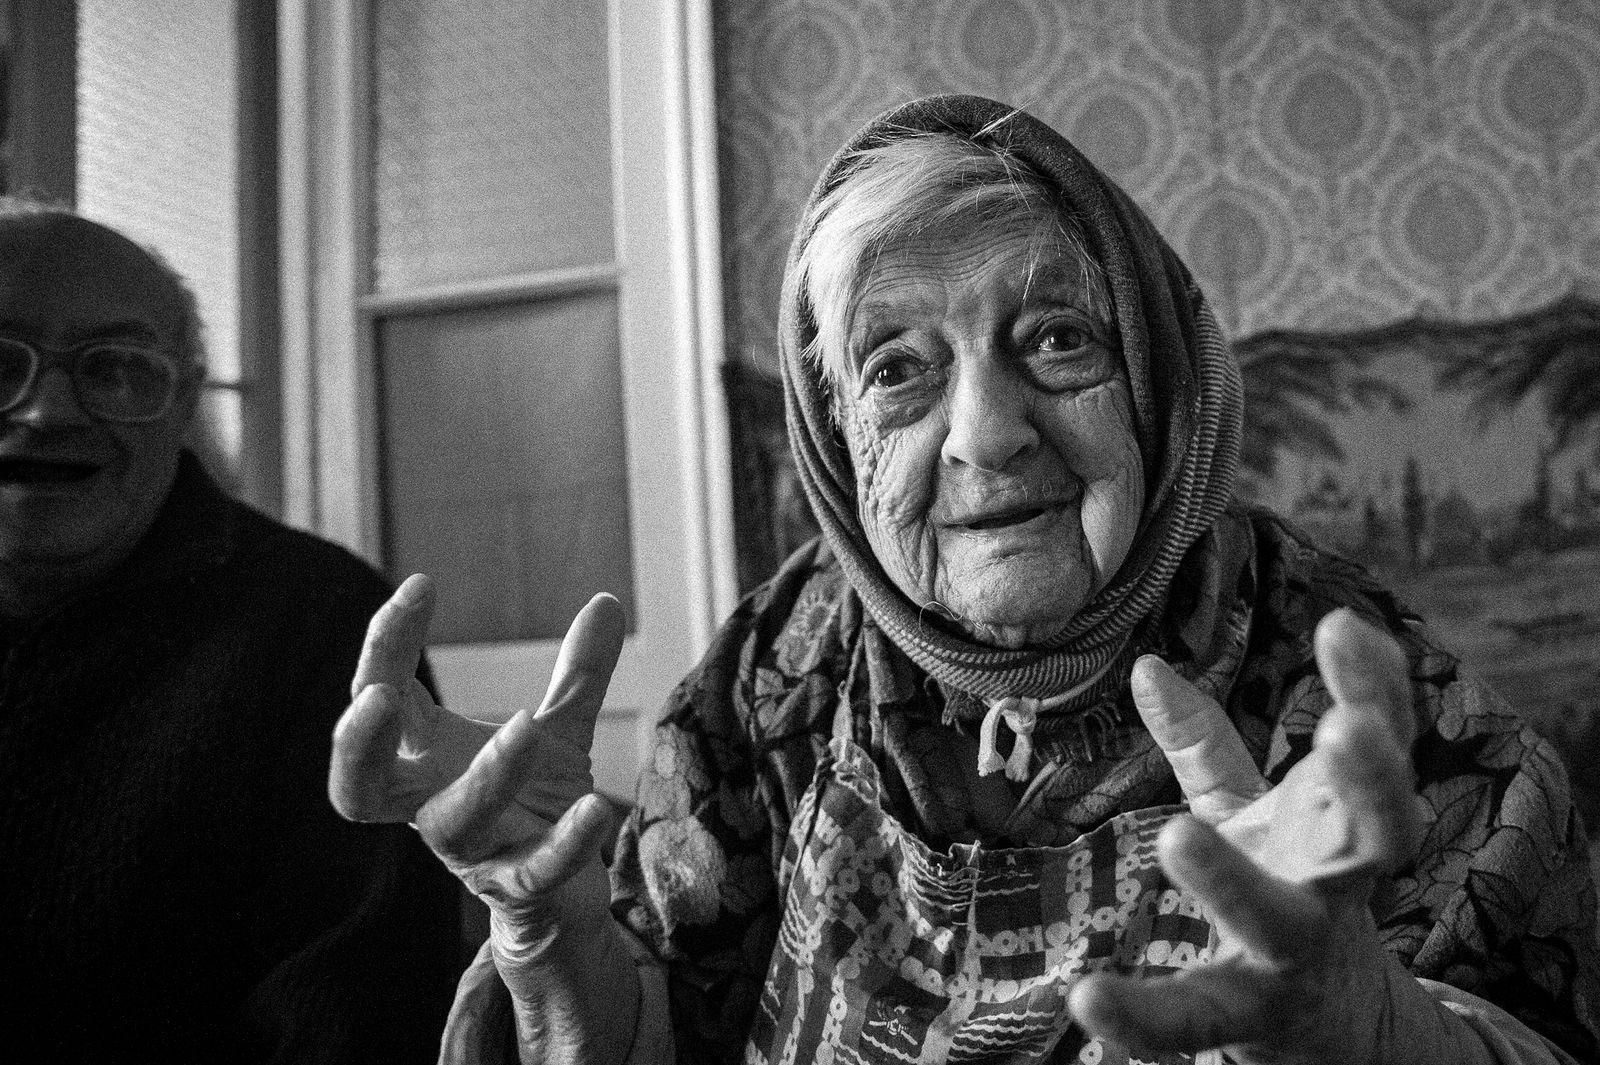 Arik Shraga. Ukraine. Sheiva and her son